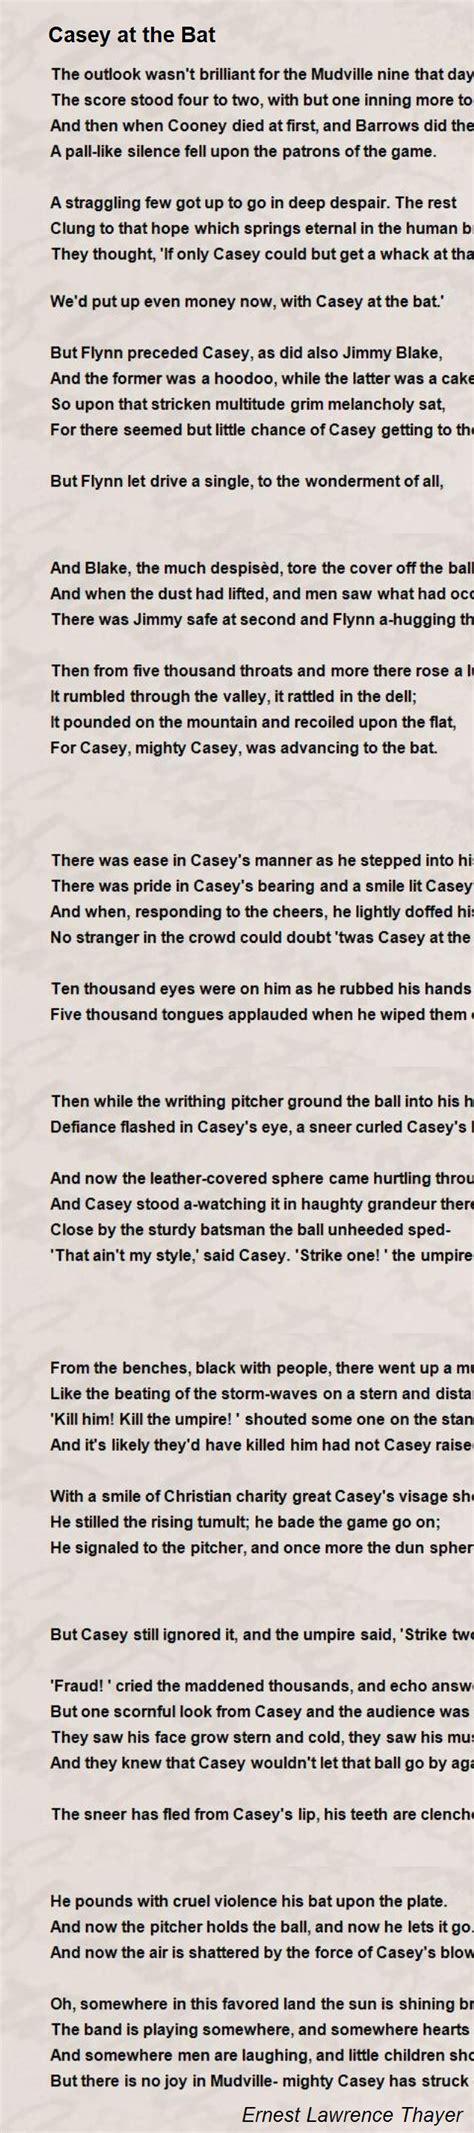 printable version of casey at the bat casey at the bat poem by ernest lawrence thayer poem hunter